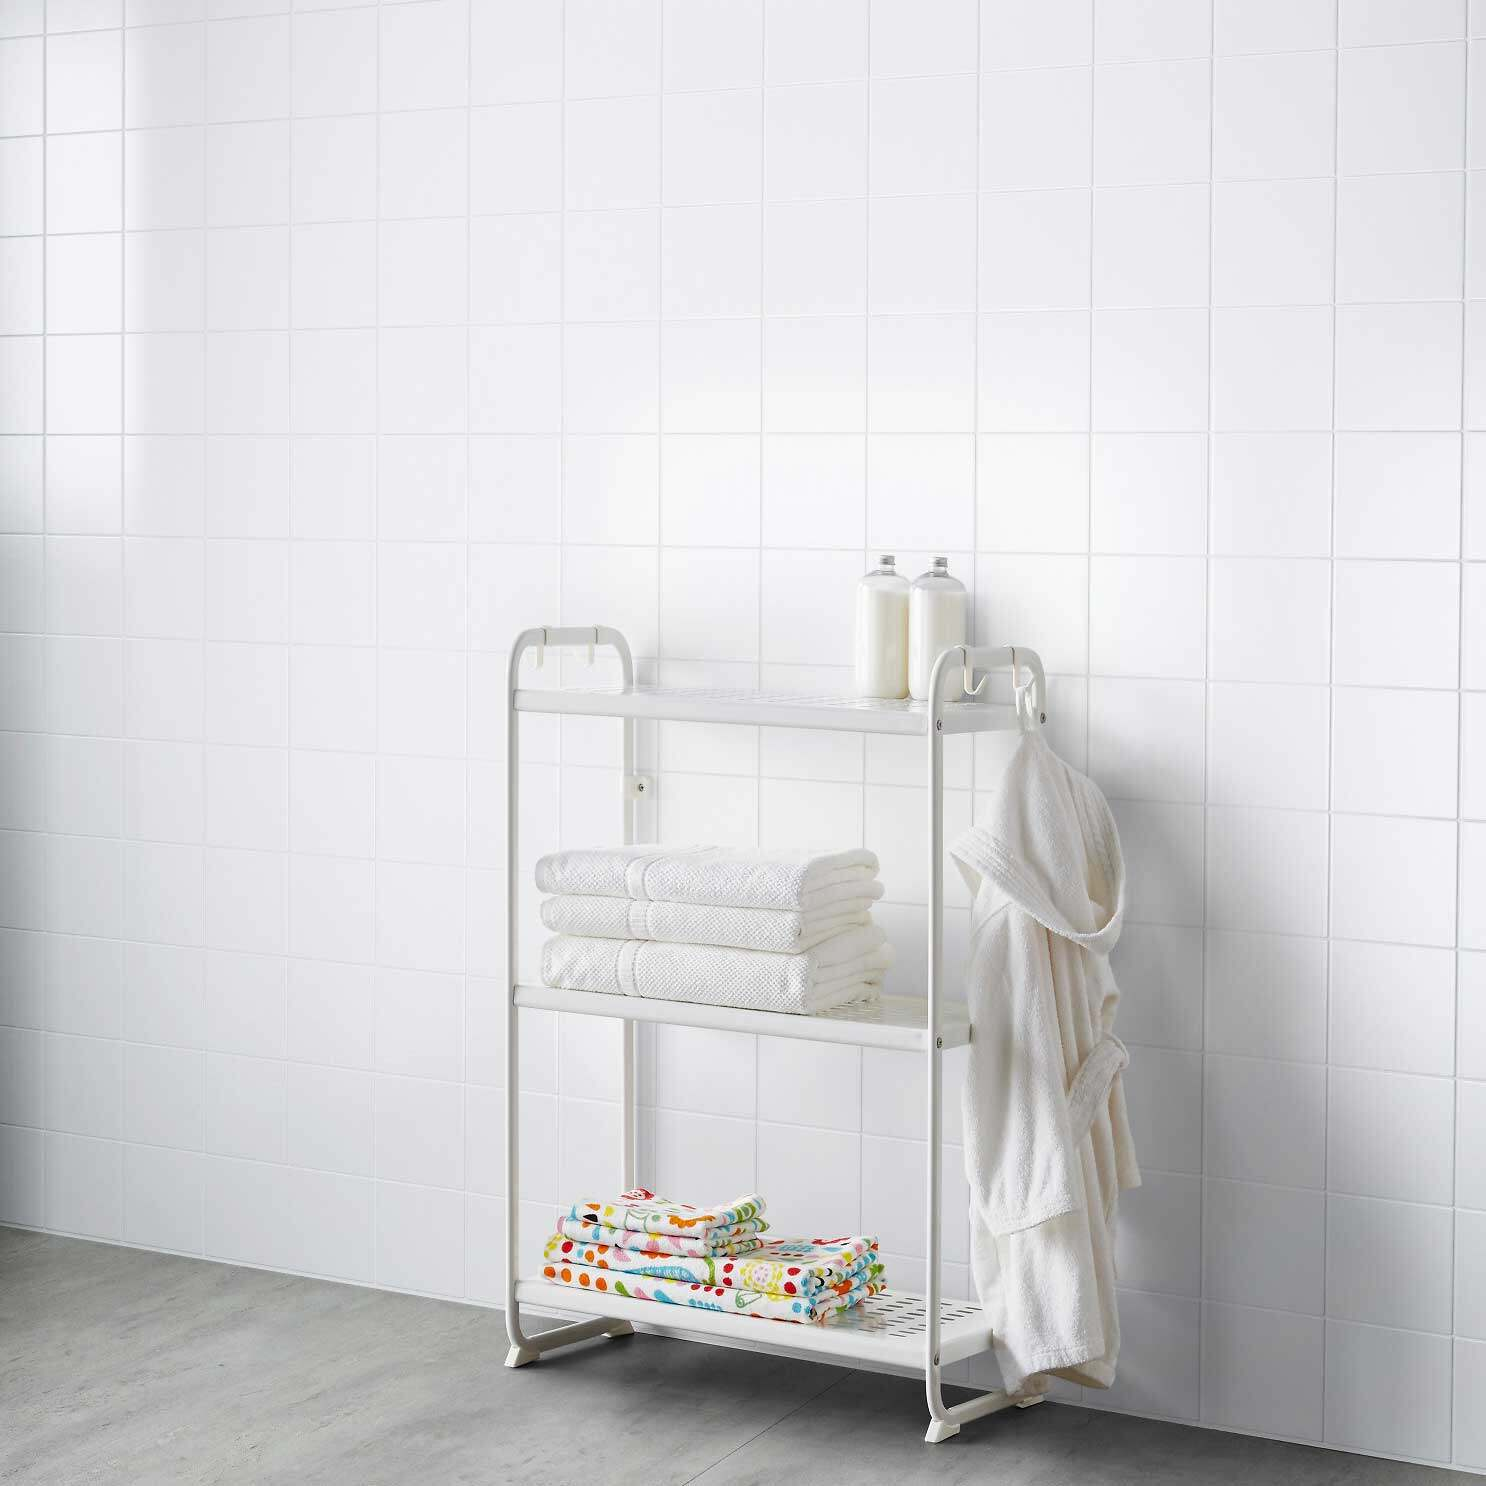 ikea 902 410 43 mulig shelves shelf rack storage white